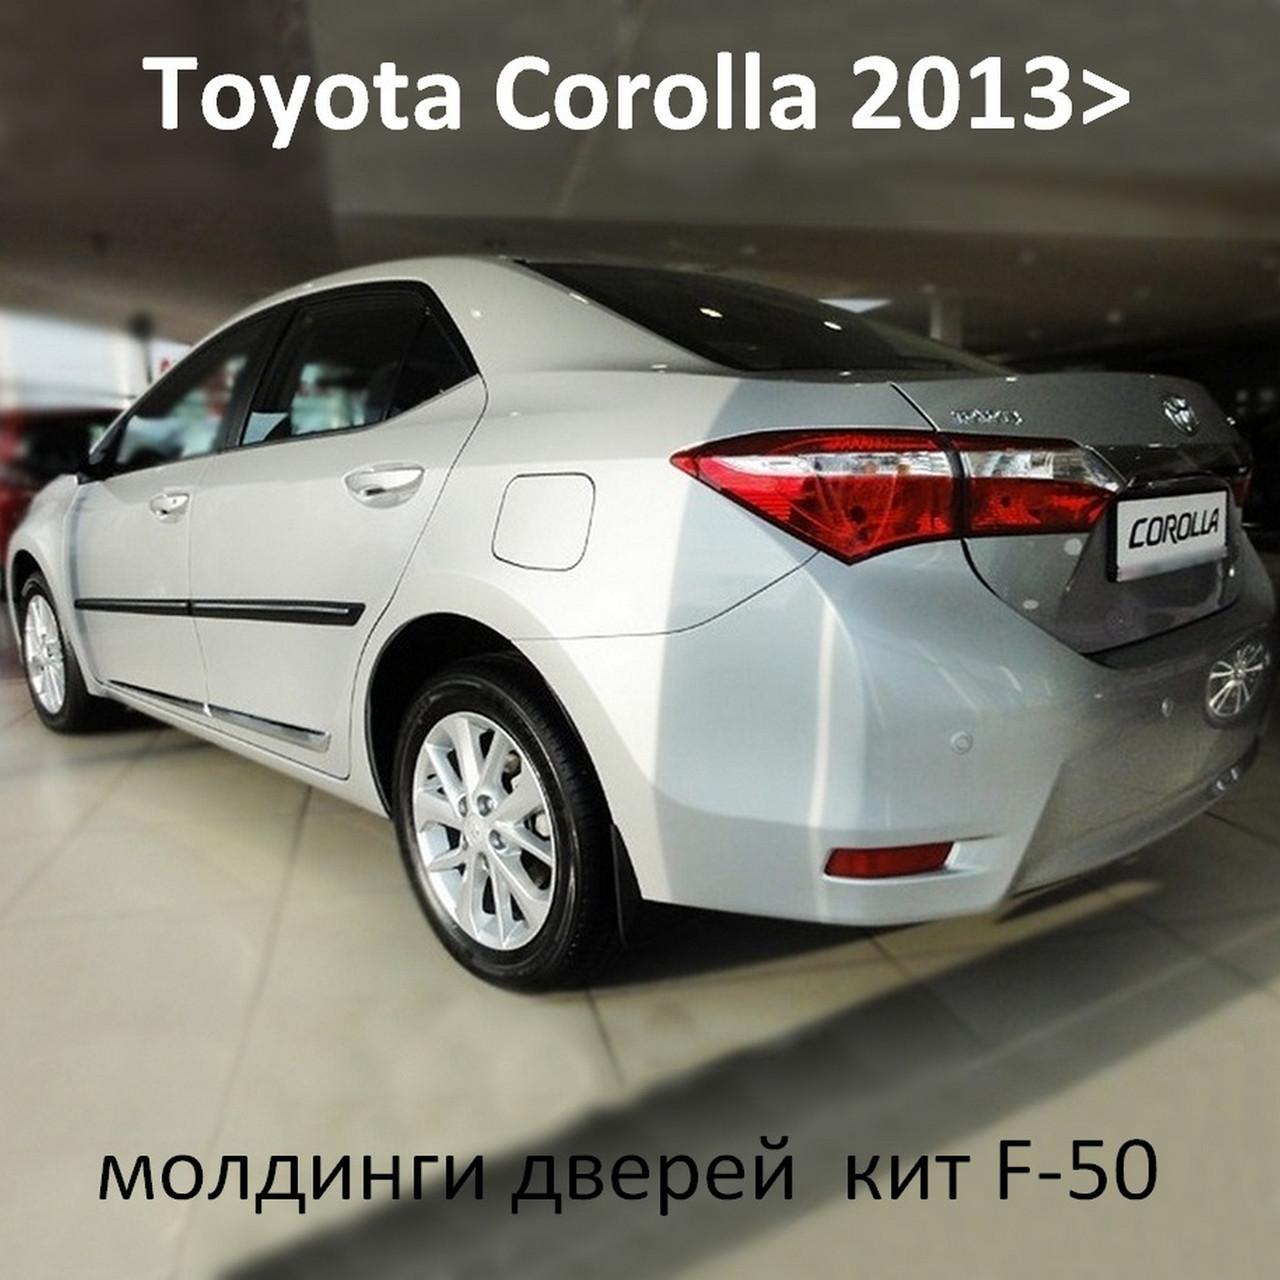 Молдинги на двері для Toyota Corolla 2013-2018